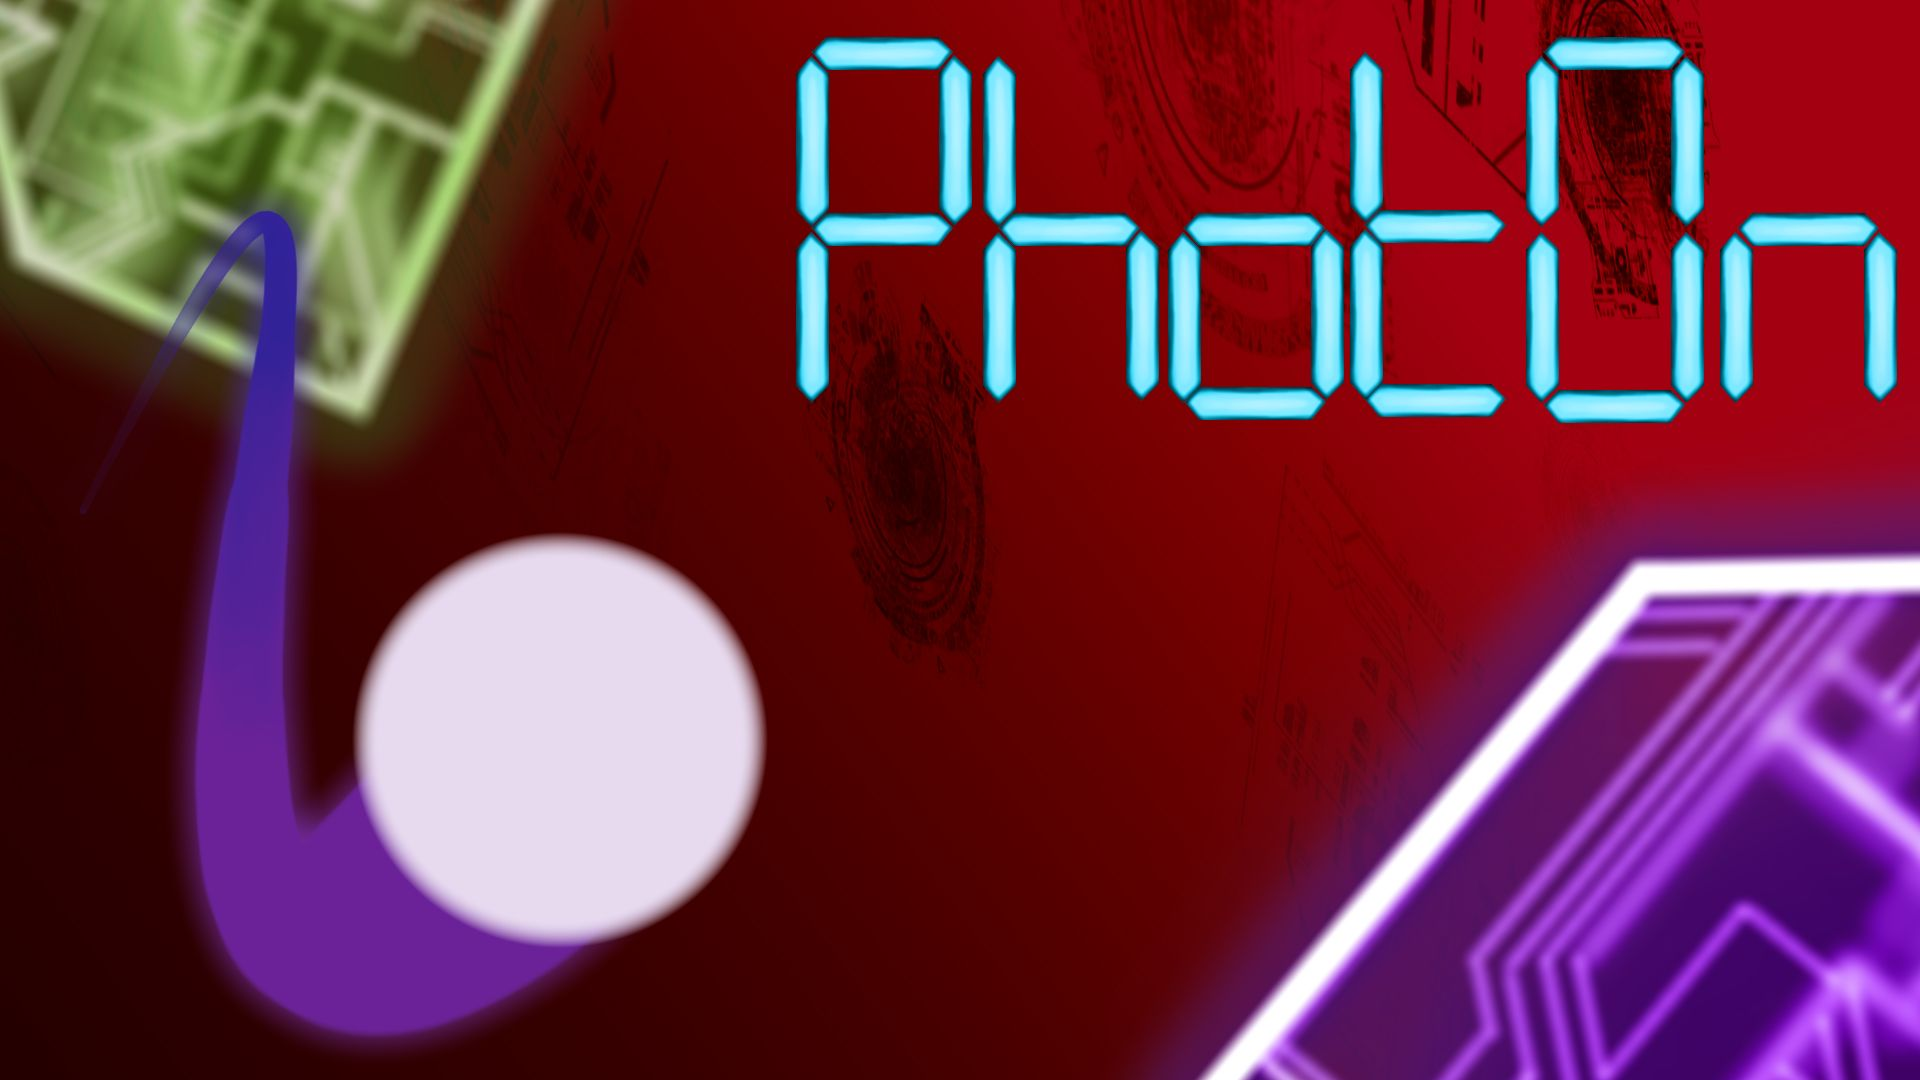 Phot0n